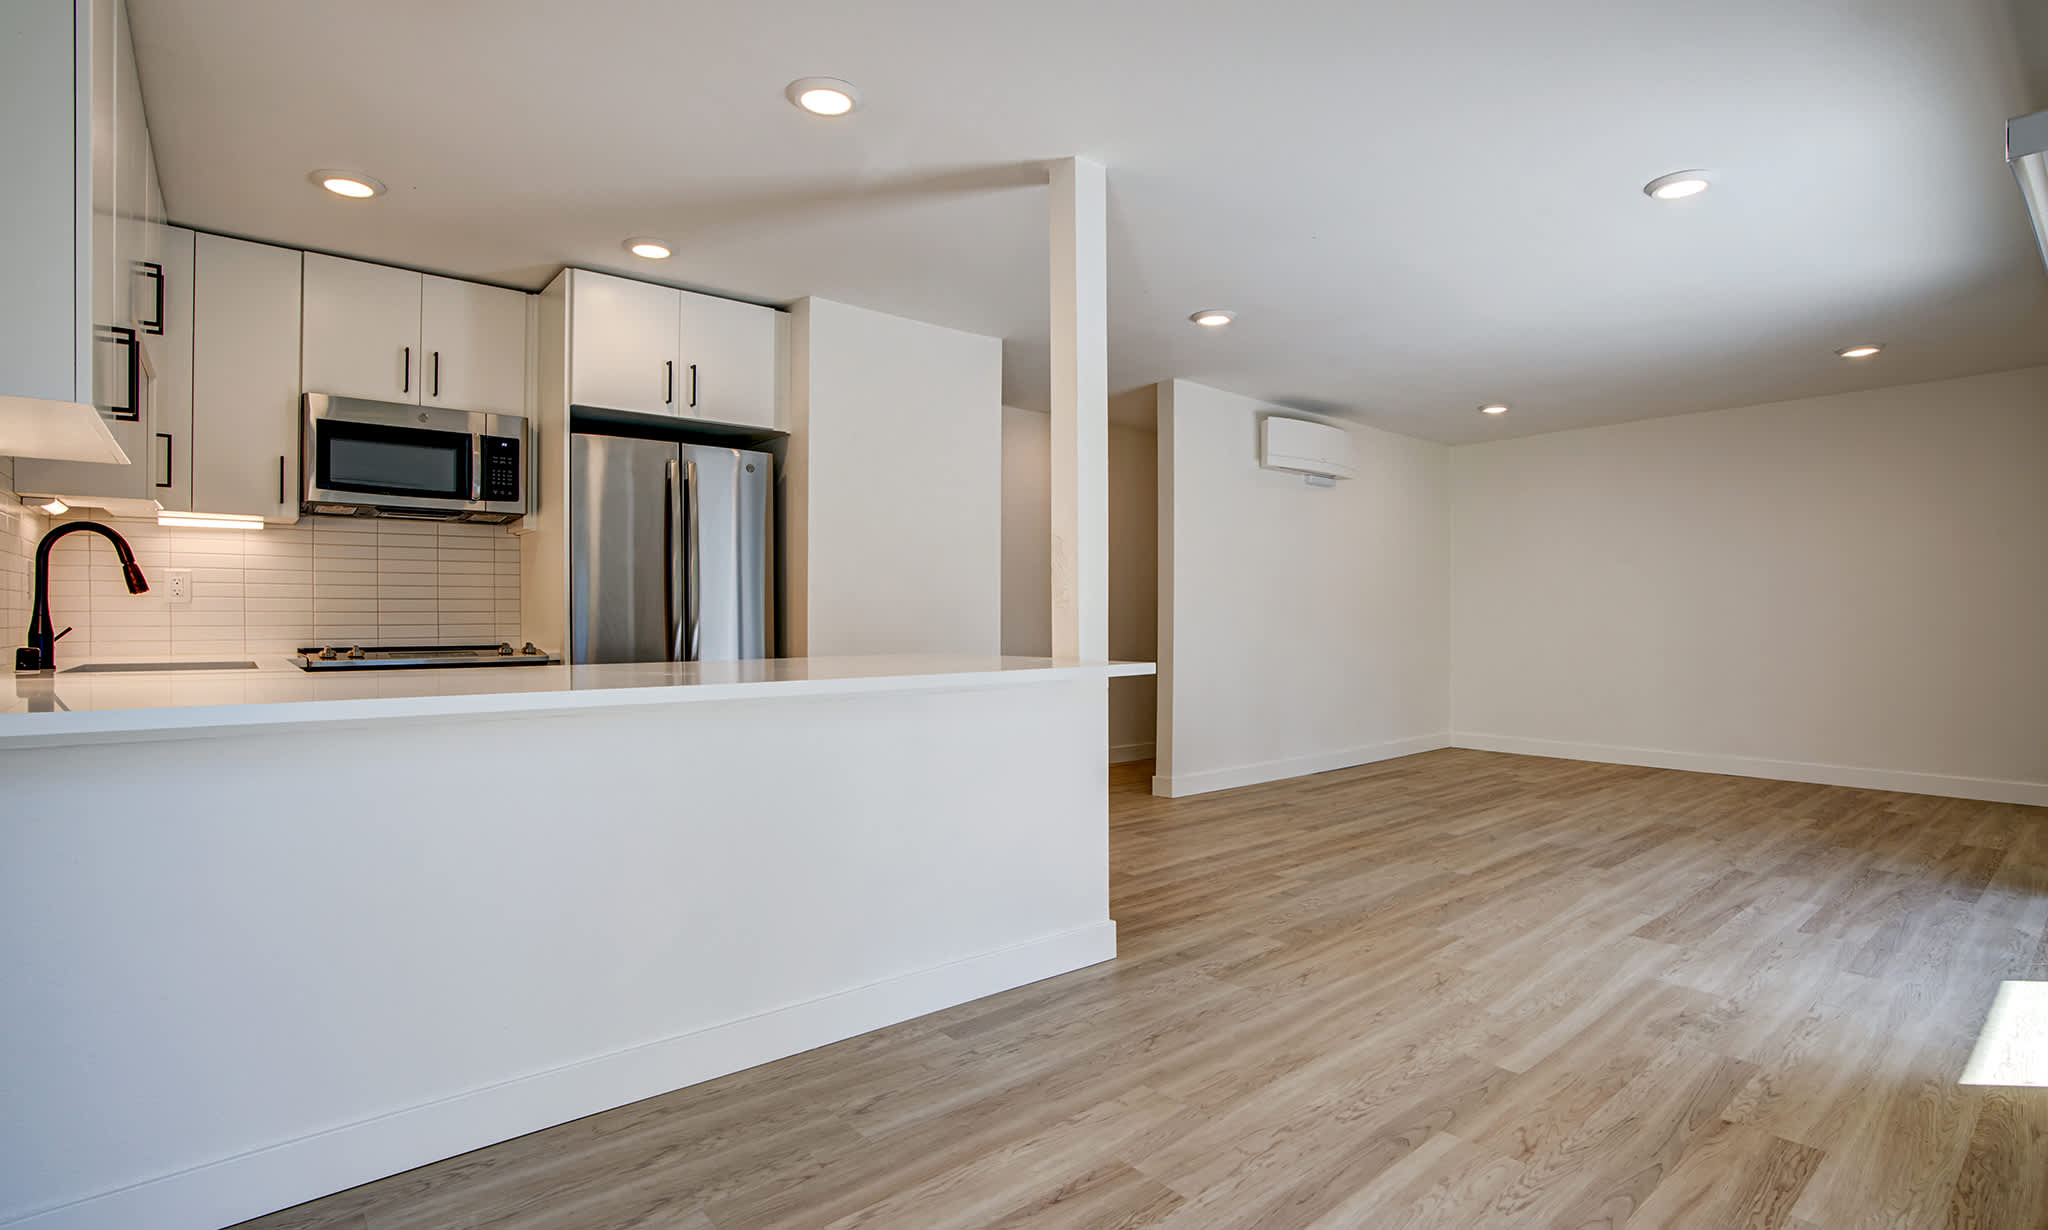 Boardwalk Apartments apartments in Santa Clara CA to rent photo 7